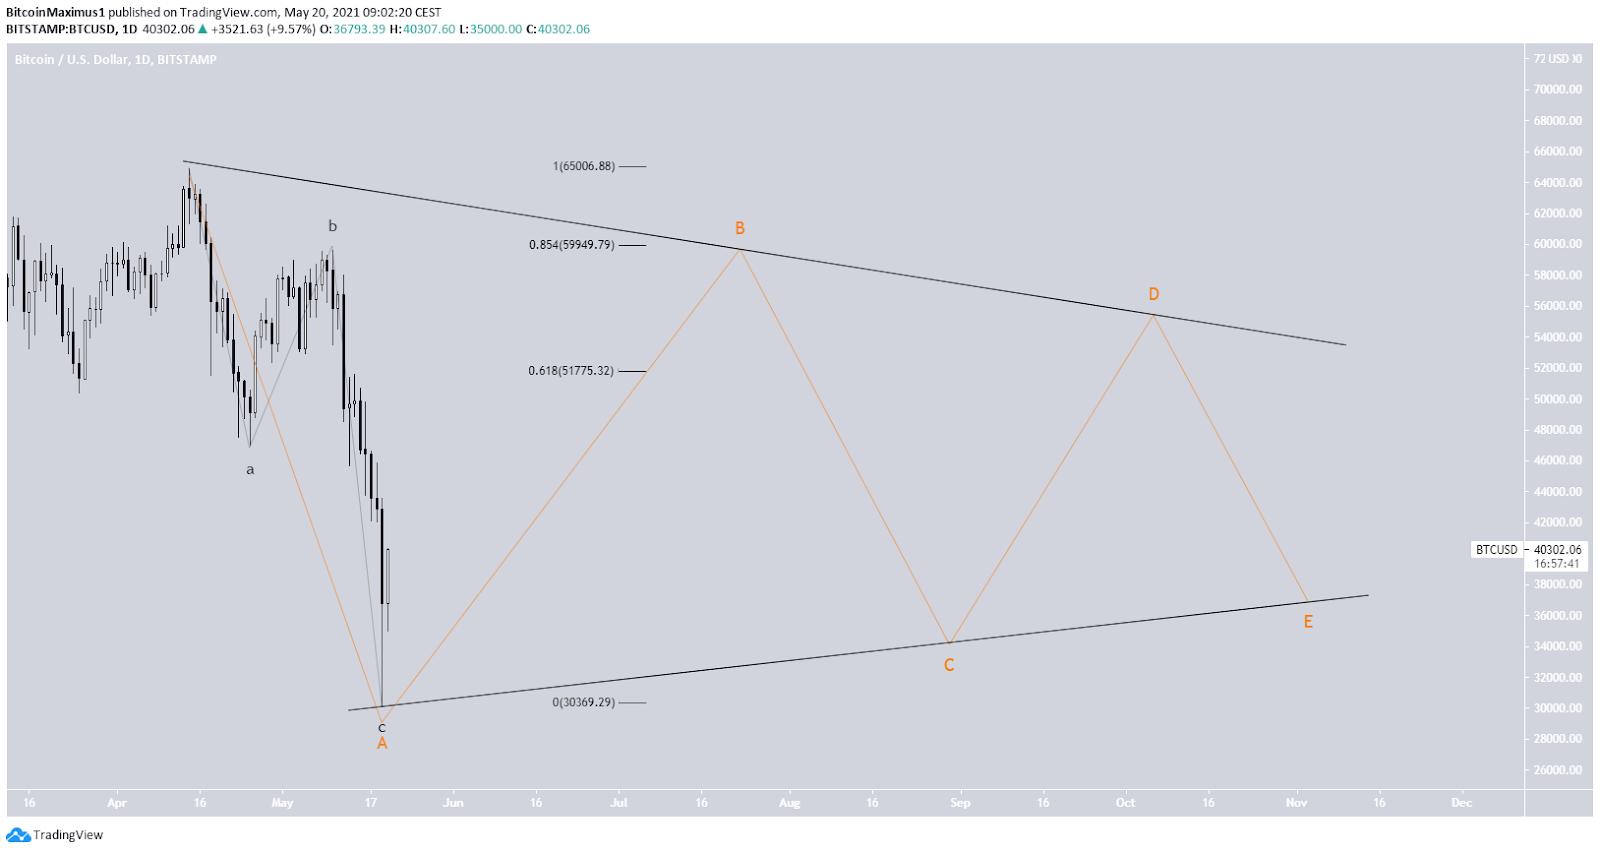 Bitcoin Kurs Preis Wellenanalyse 20.05.2021